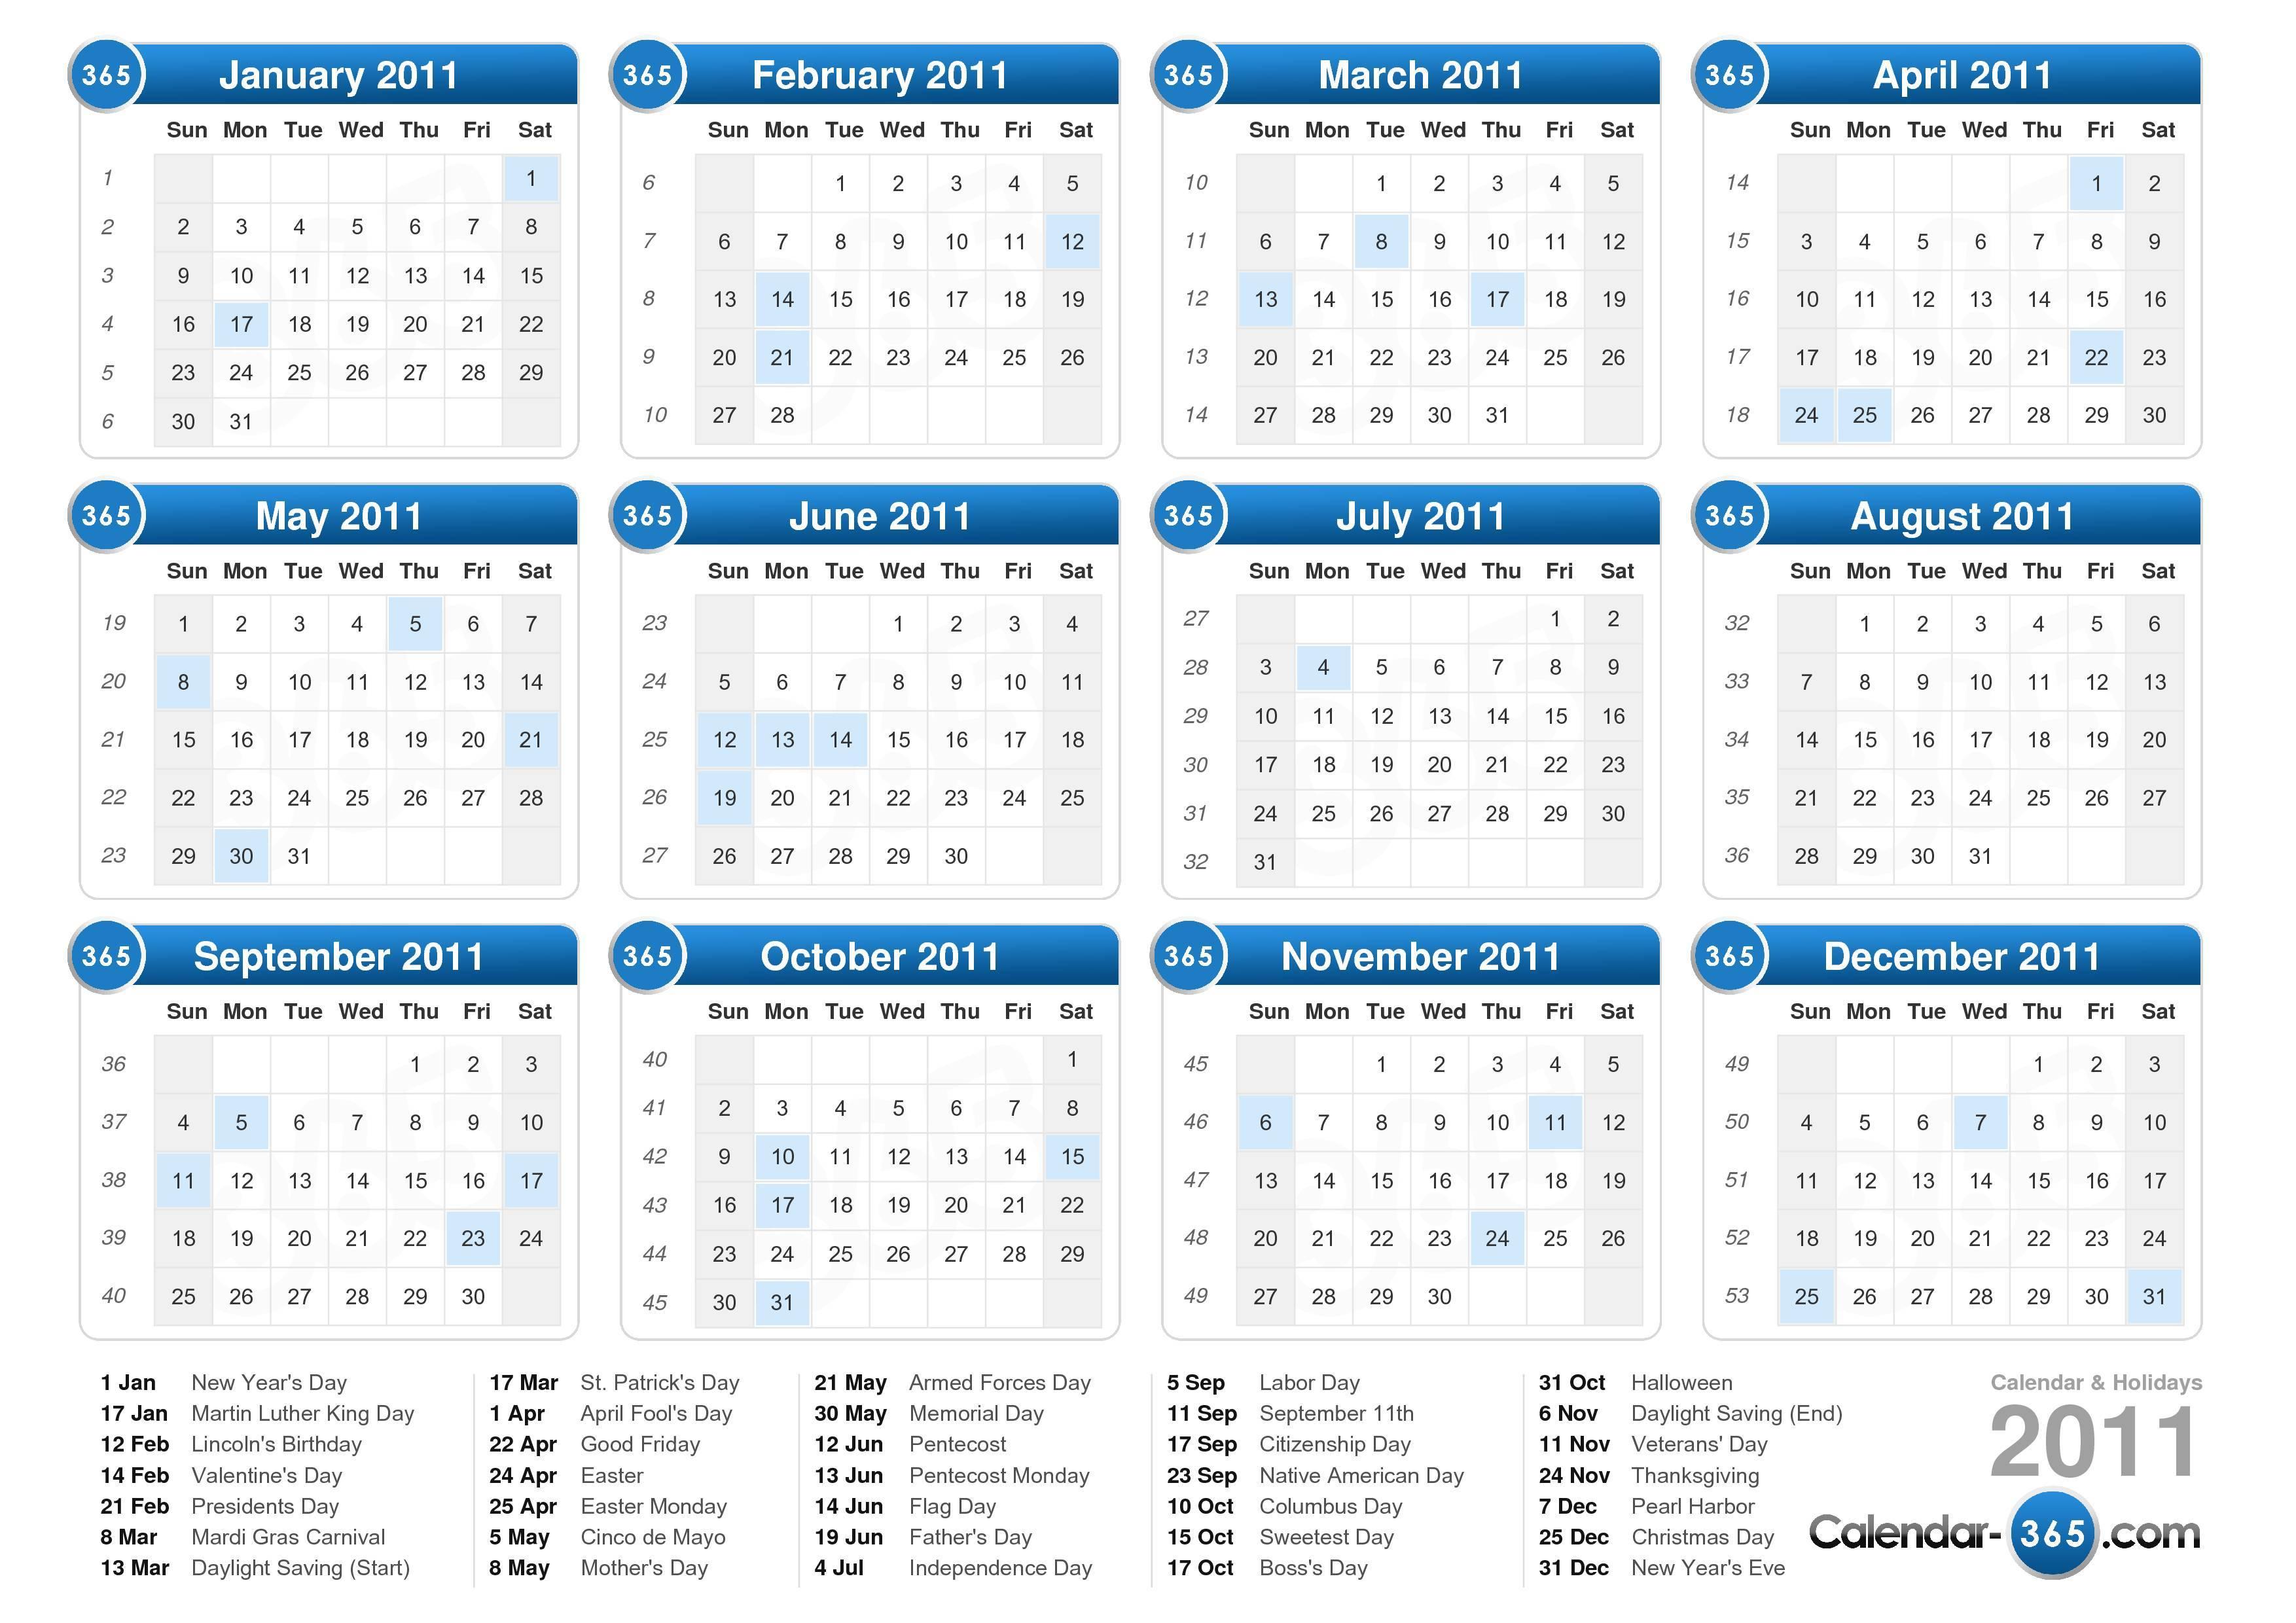 Year Calendar For 2011